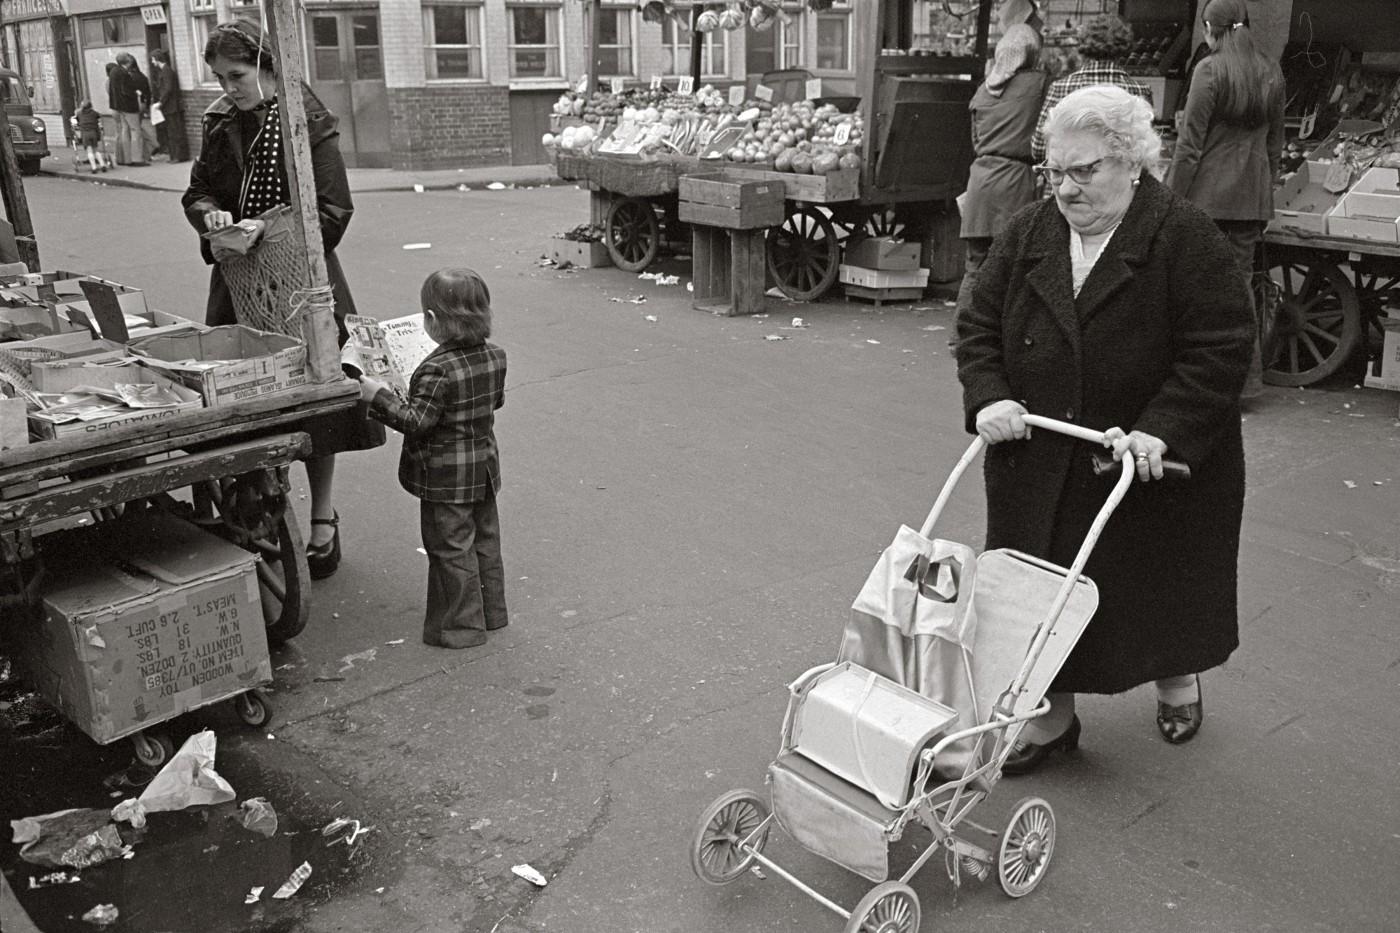 Tony Bock, </span><span><em>Shoppers, Watney Street Market, London</em>, </span><span>1976